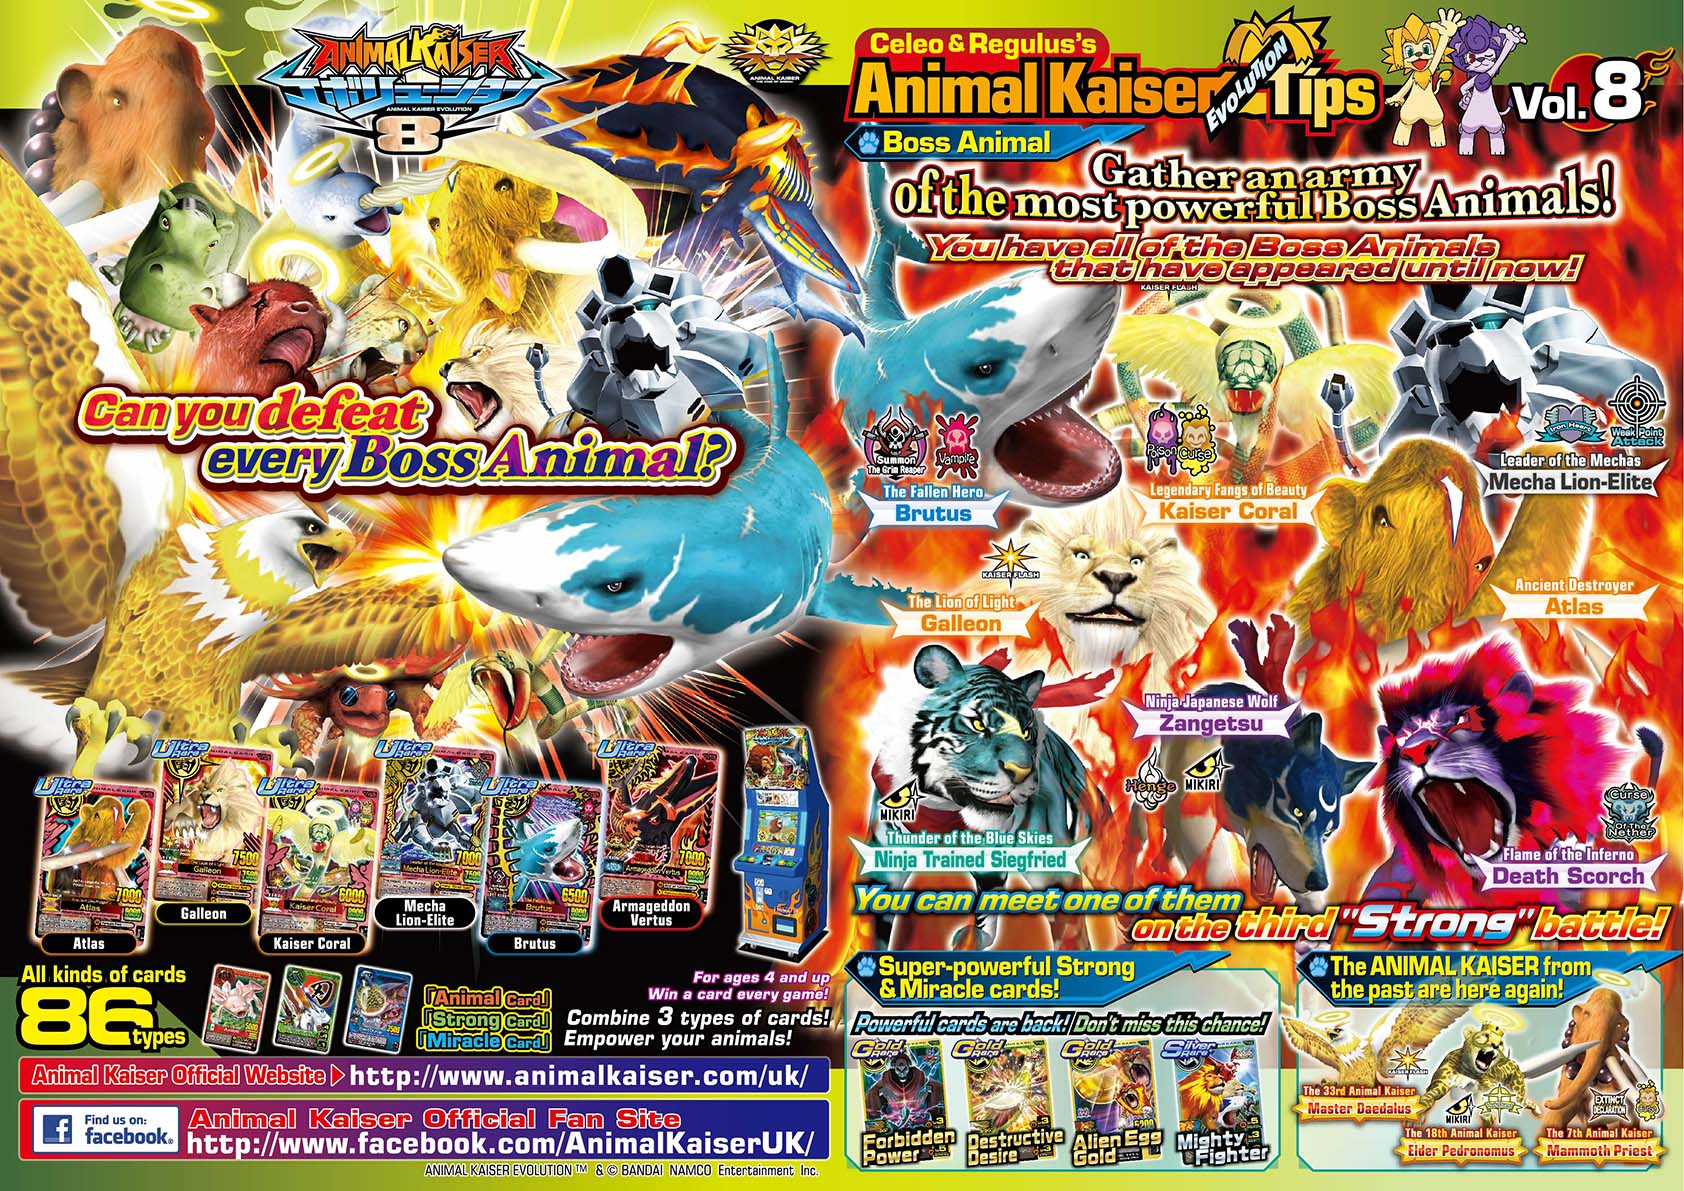 Animal Kaiser Card Evo 7 Rare // Animal // Strong // Miracle